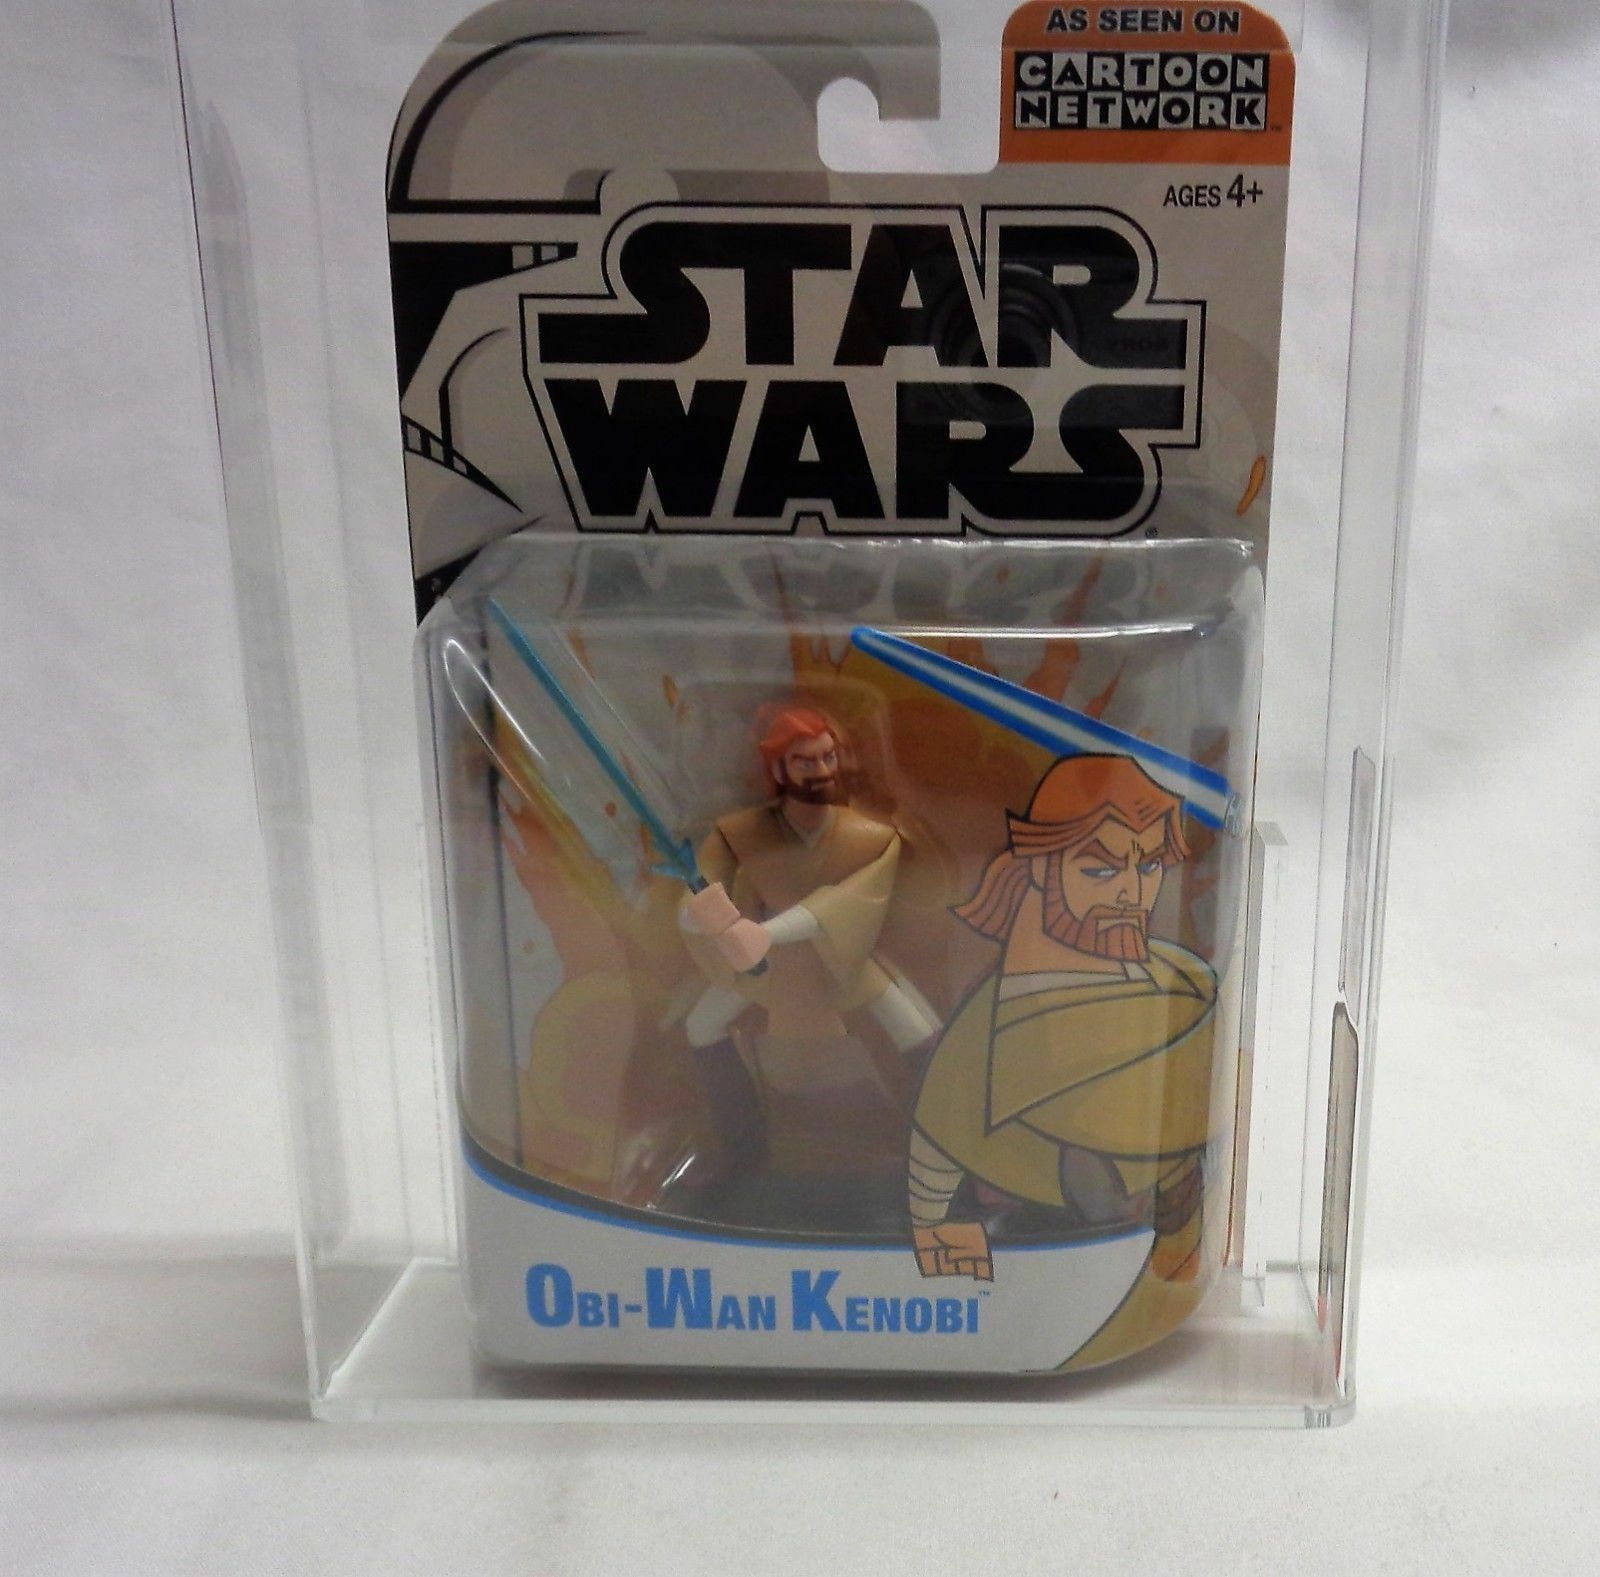 2004 Star Wars The Clone Ben Wars Animated Series Ben Clone Obi-Wan Kenobi Figure AFA 8.5 52b143